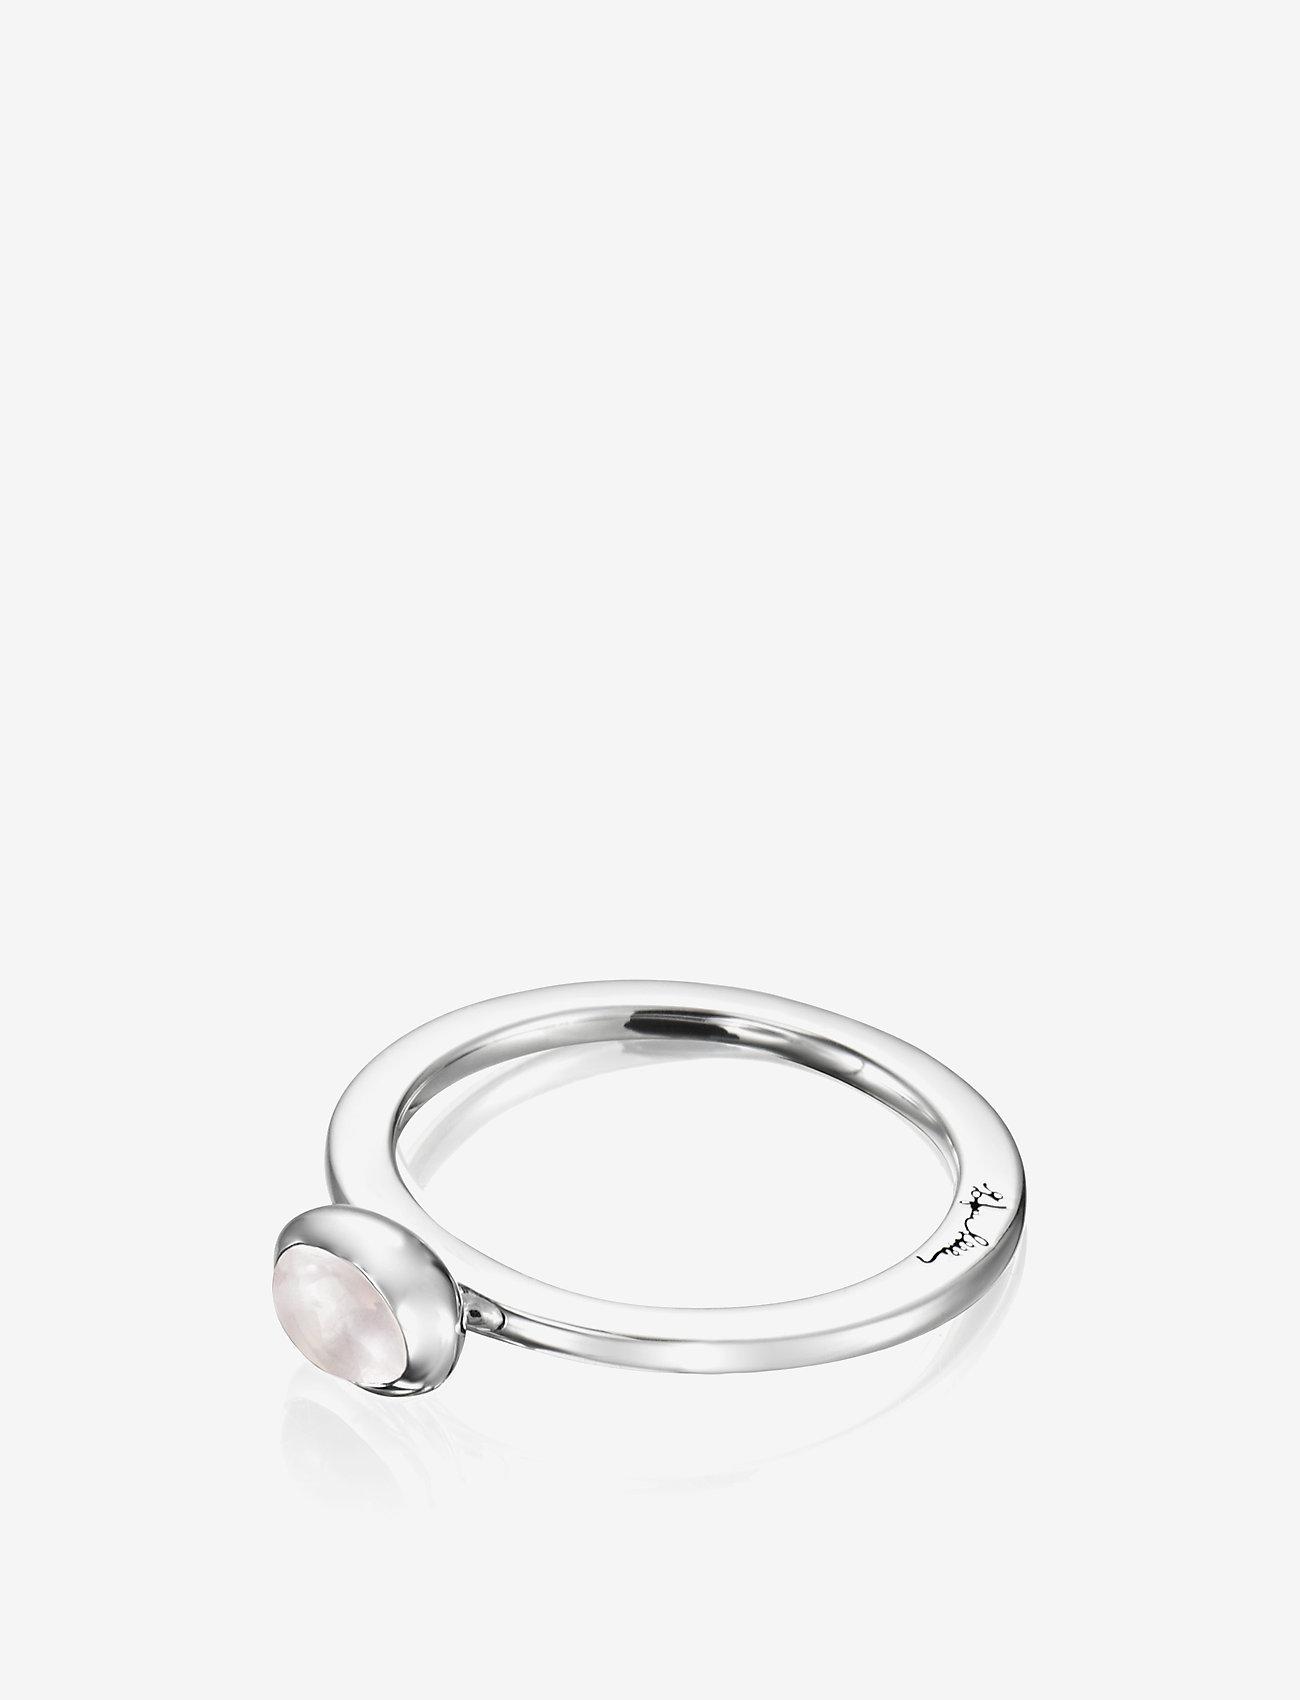 Efva Attling Love Bead Ring Silver - Rose Quartz - Biżuteria SILVER - Akcesoria